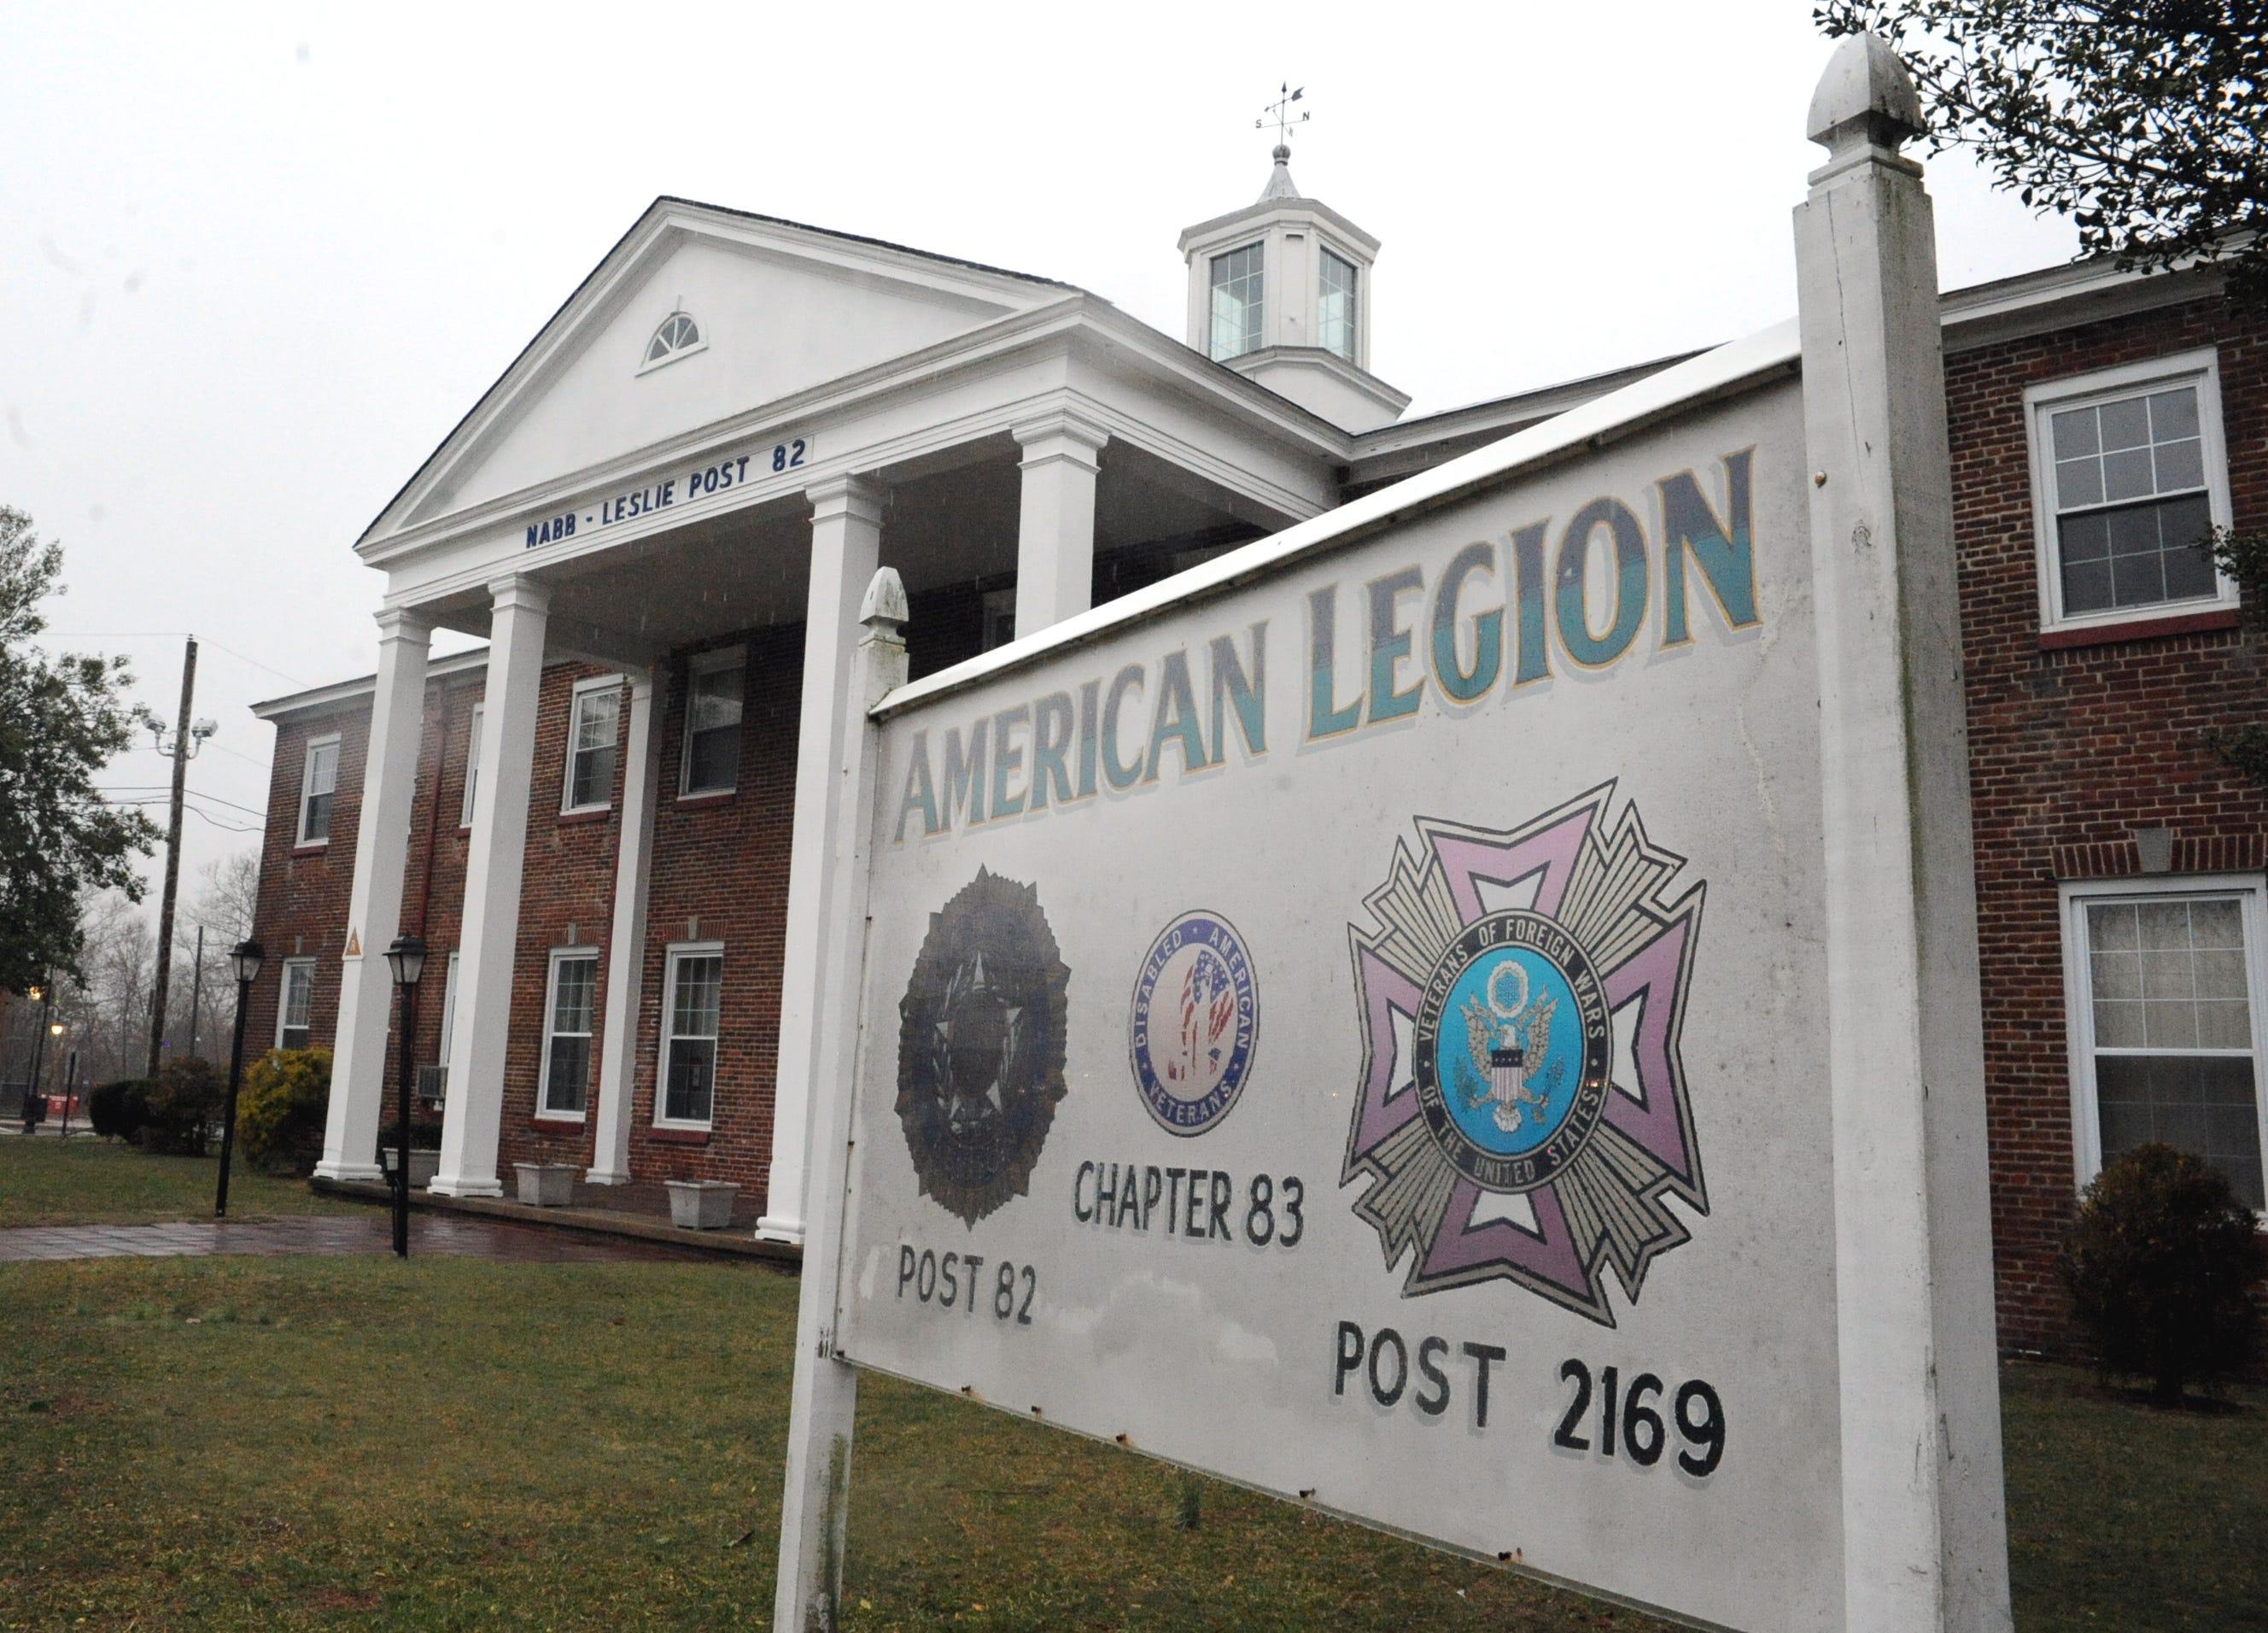 Legion хостинг что такое абуза у хостинга